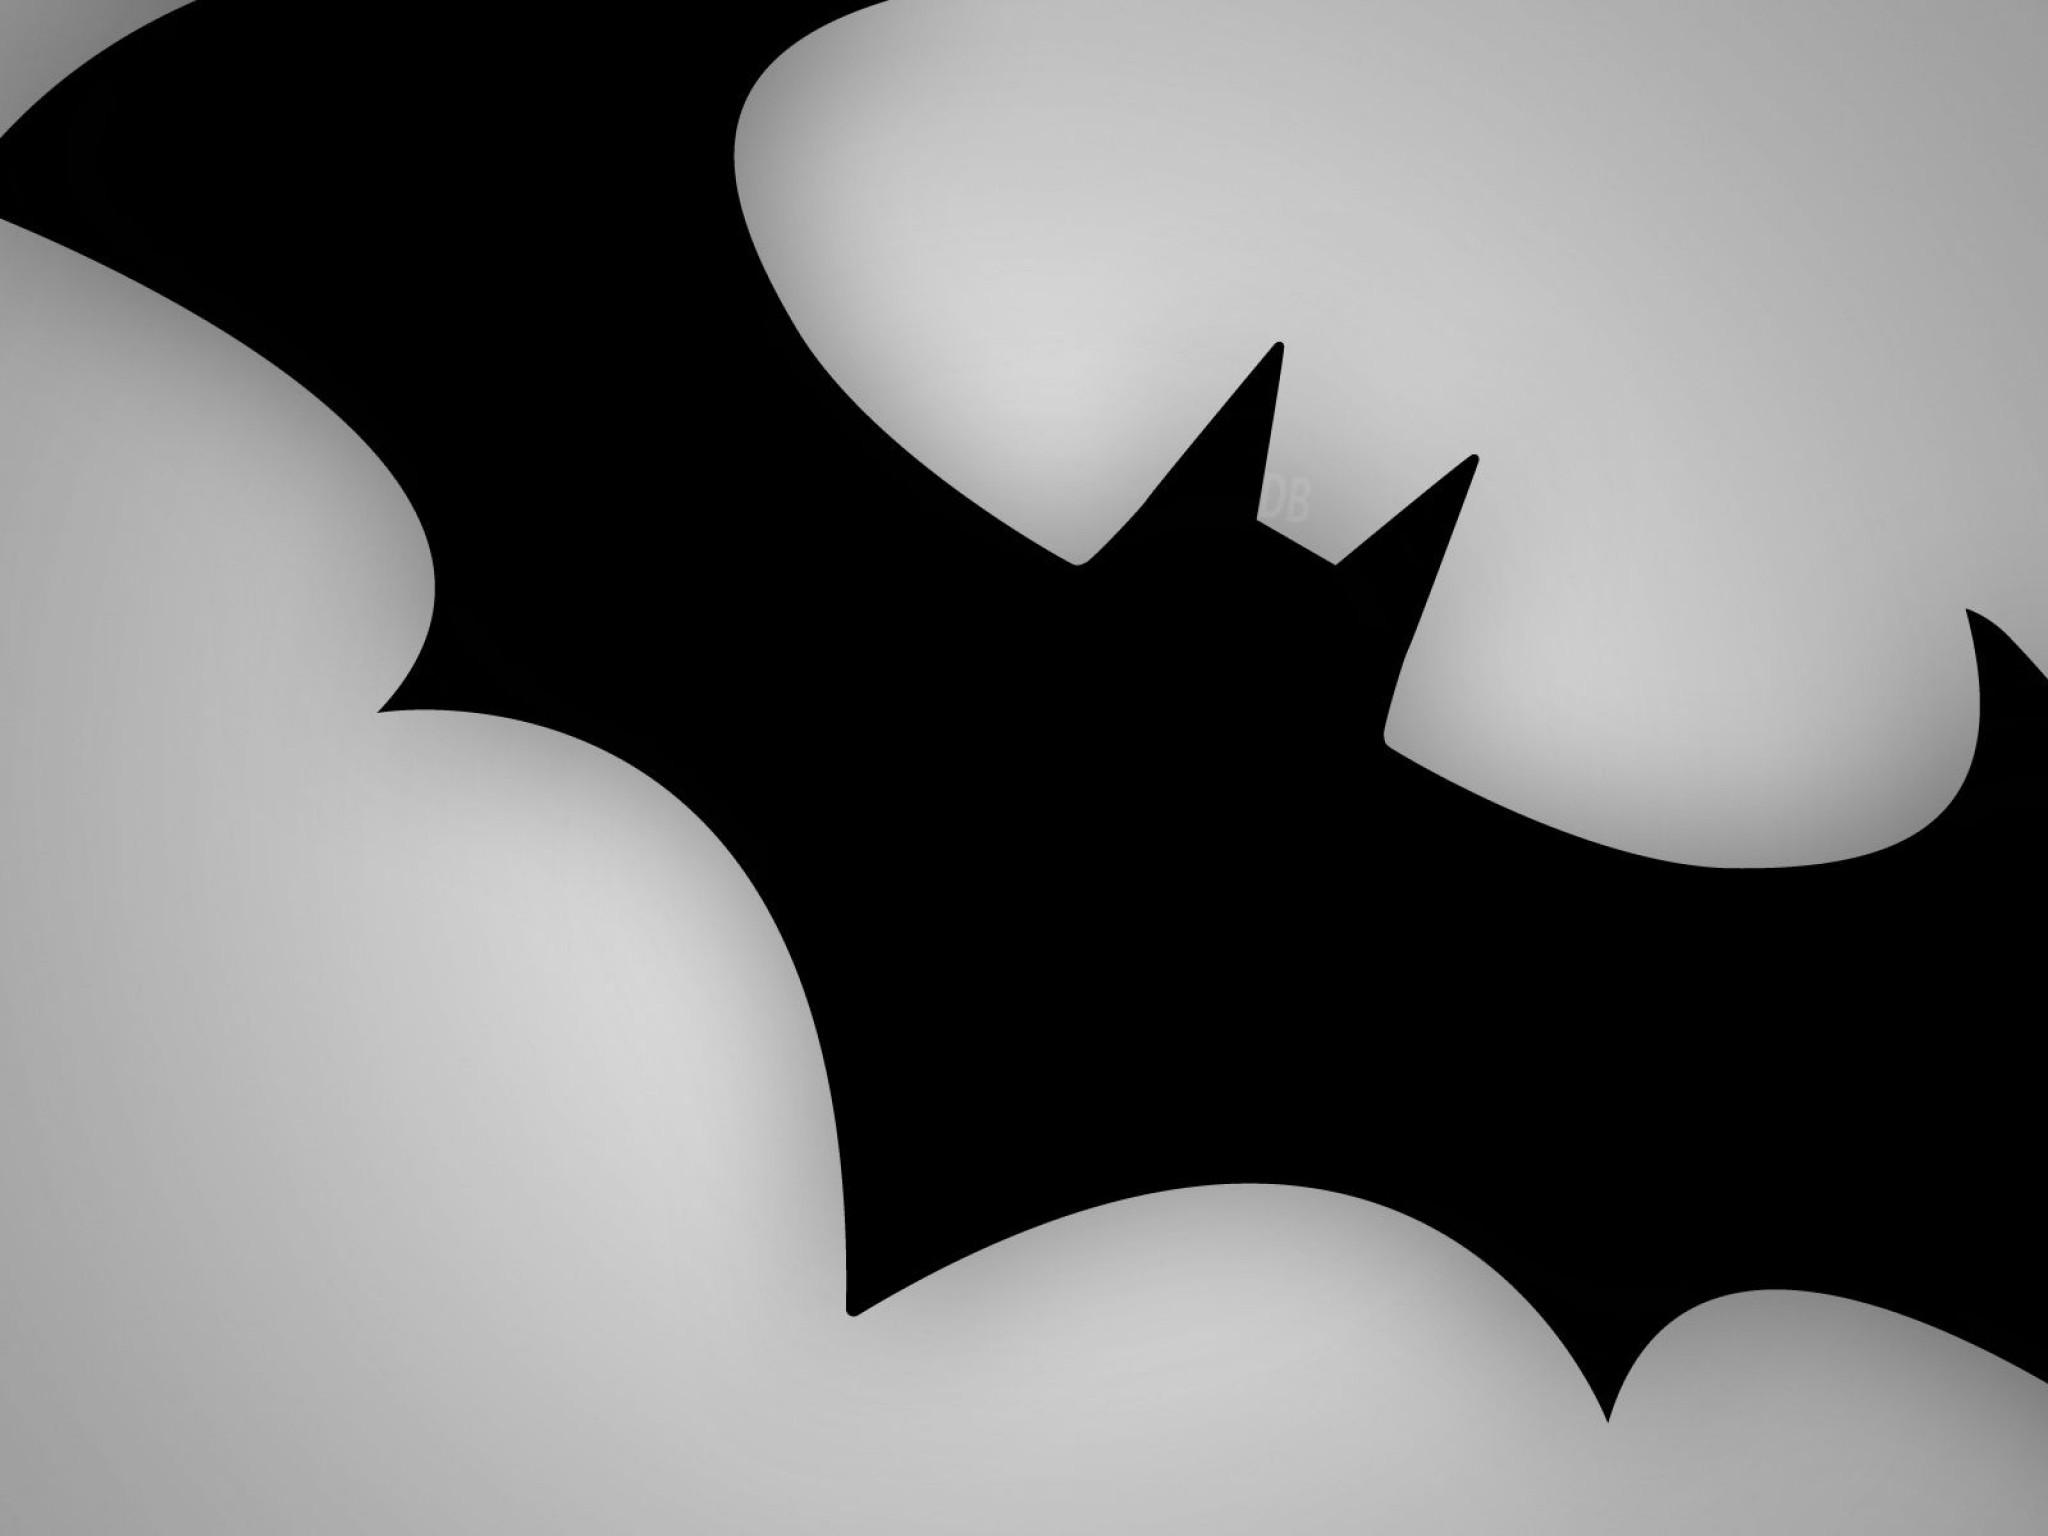 Image Detail For Colorful Ipad Wallpaper Hd 1024x1024: Batman Wallpaper For IPad